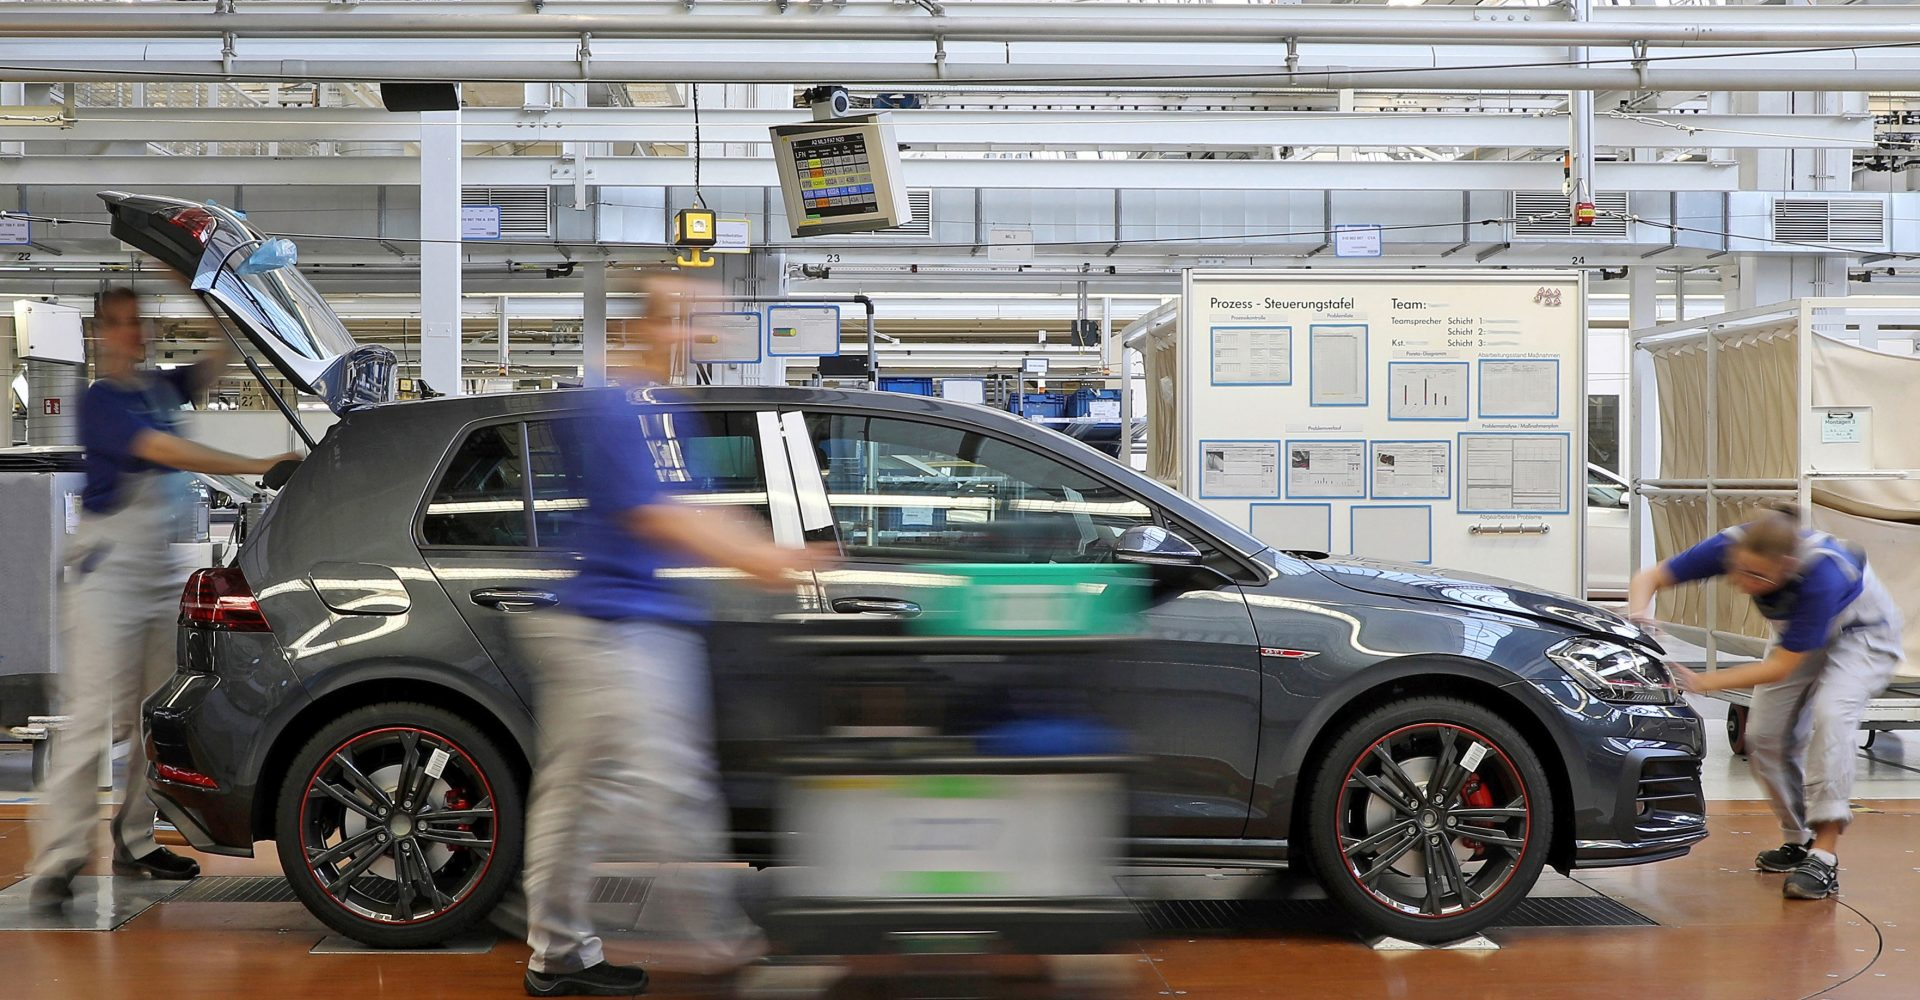 Volkswagen extends coronavirus factory shutdown